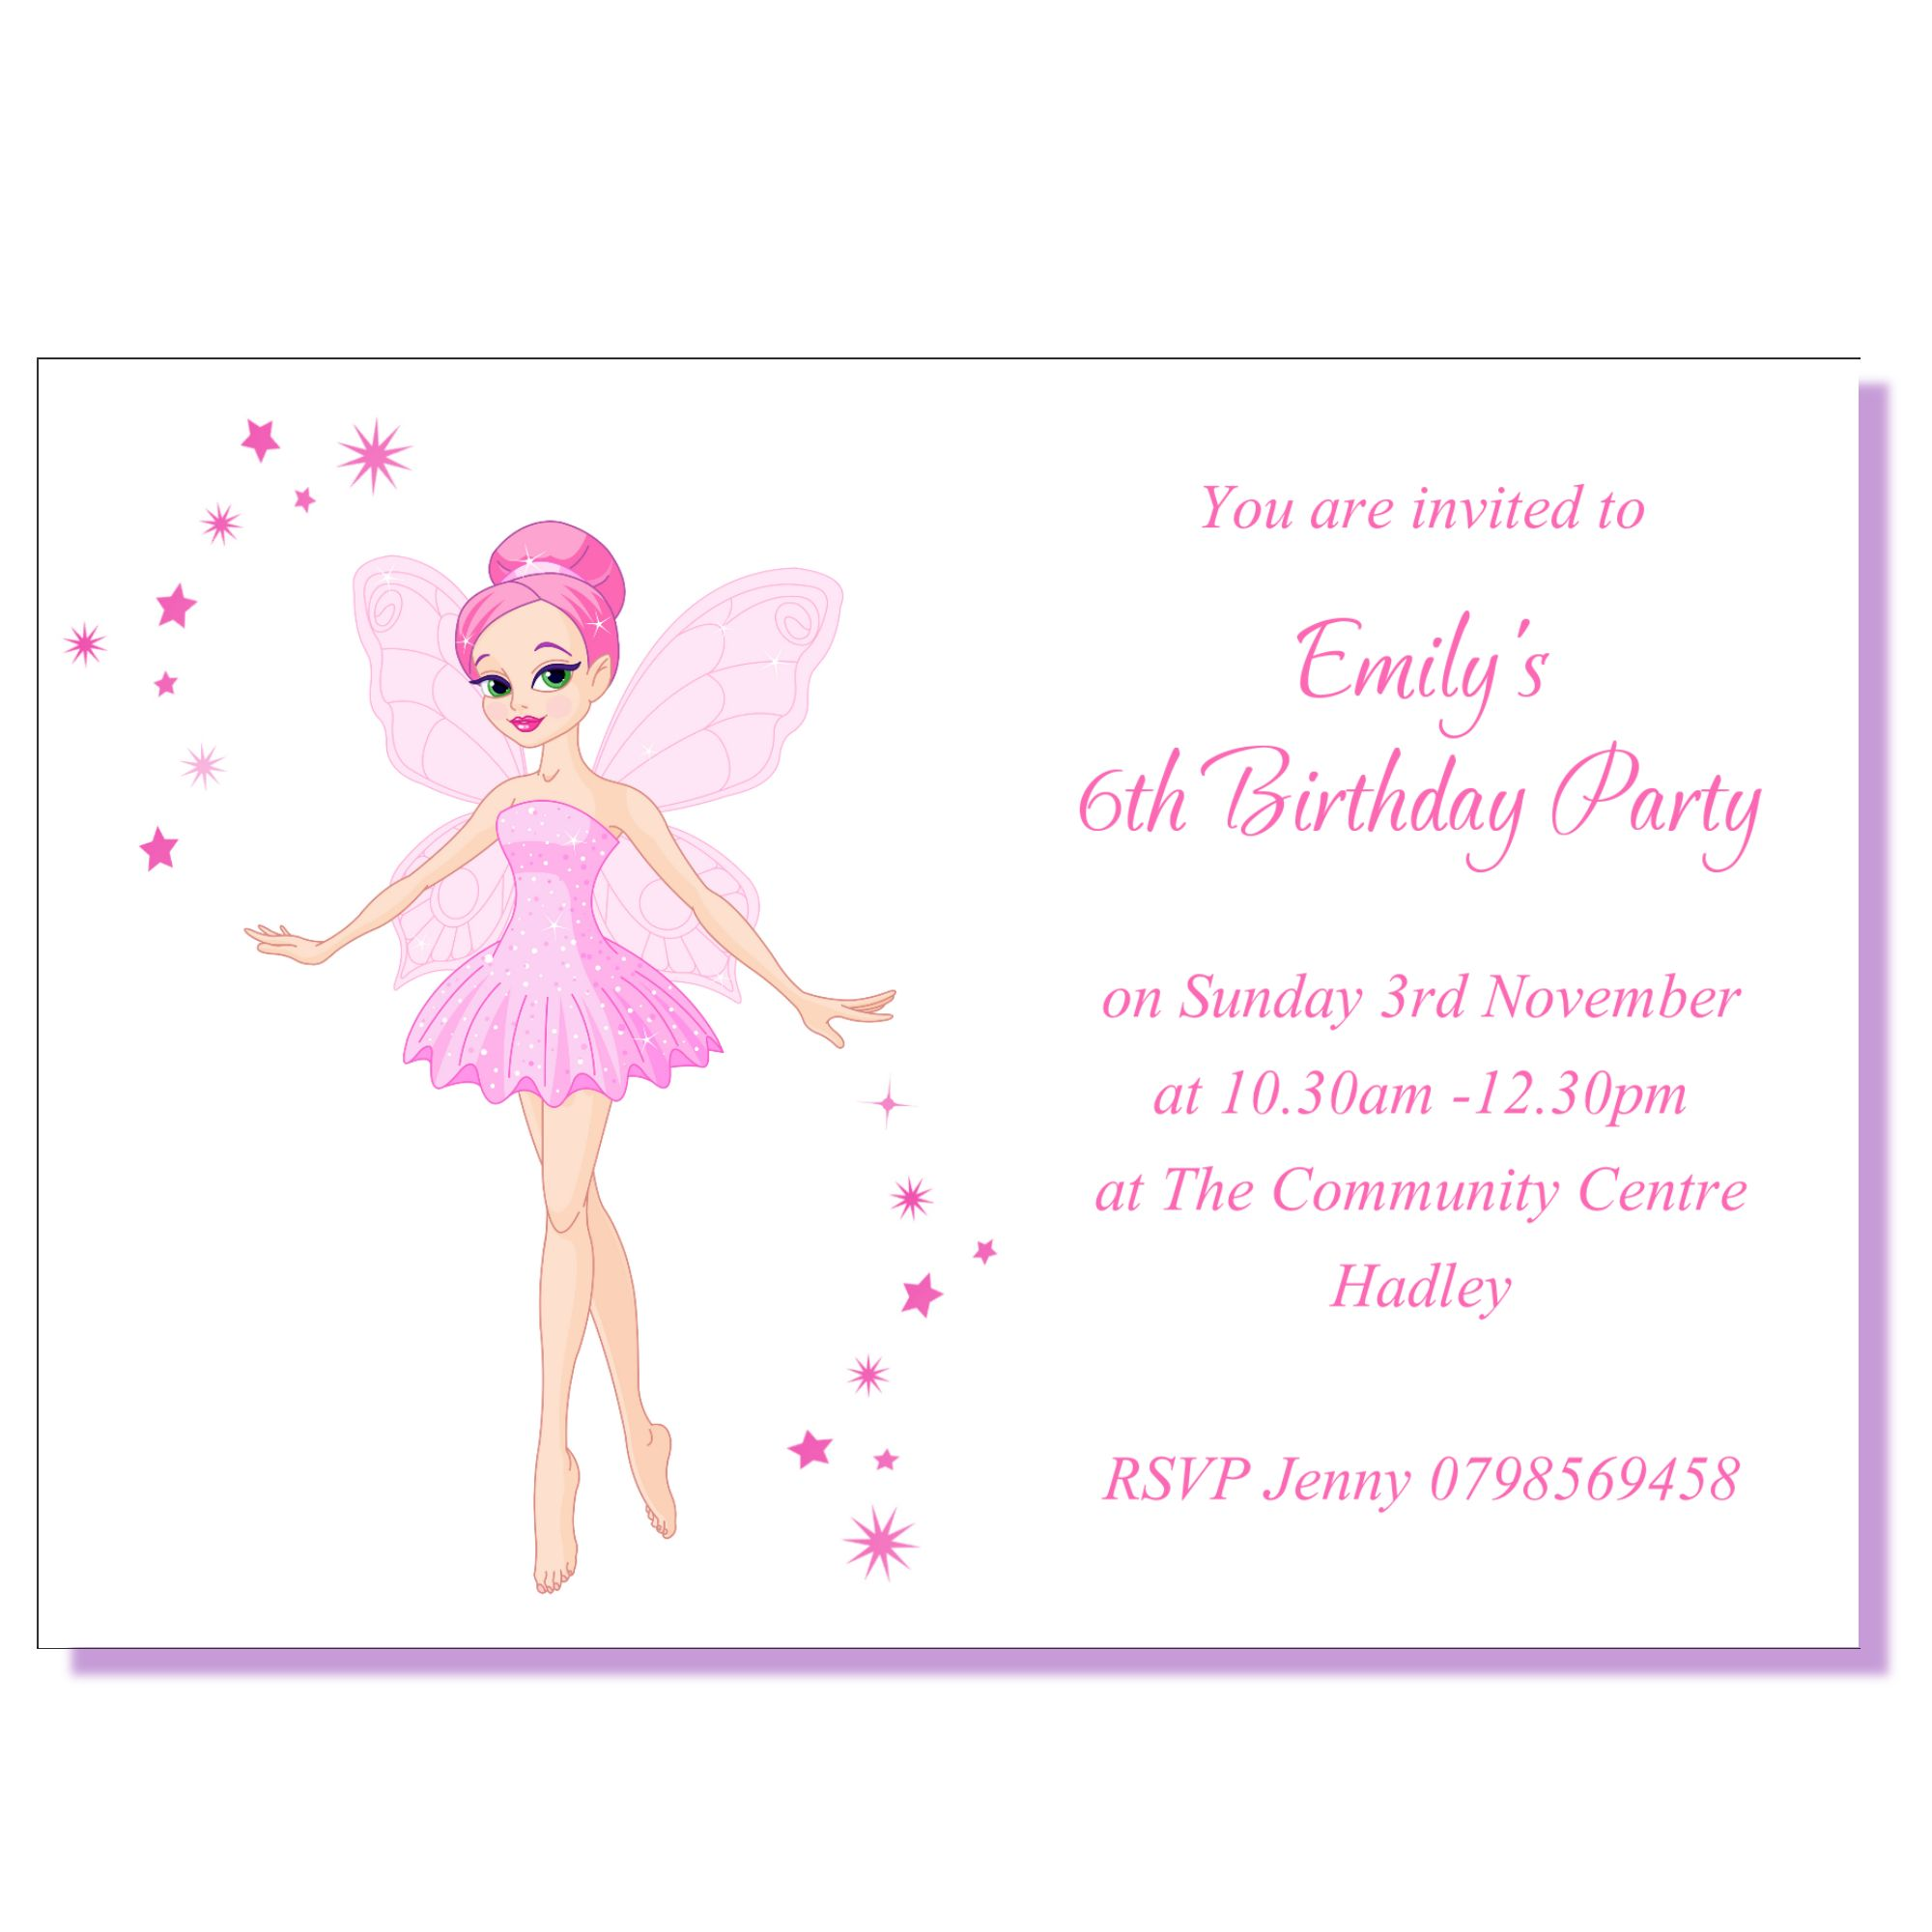 Issy Belle Cards - www.issybelle.co.uk